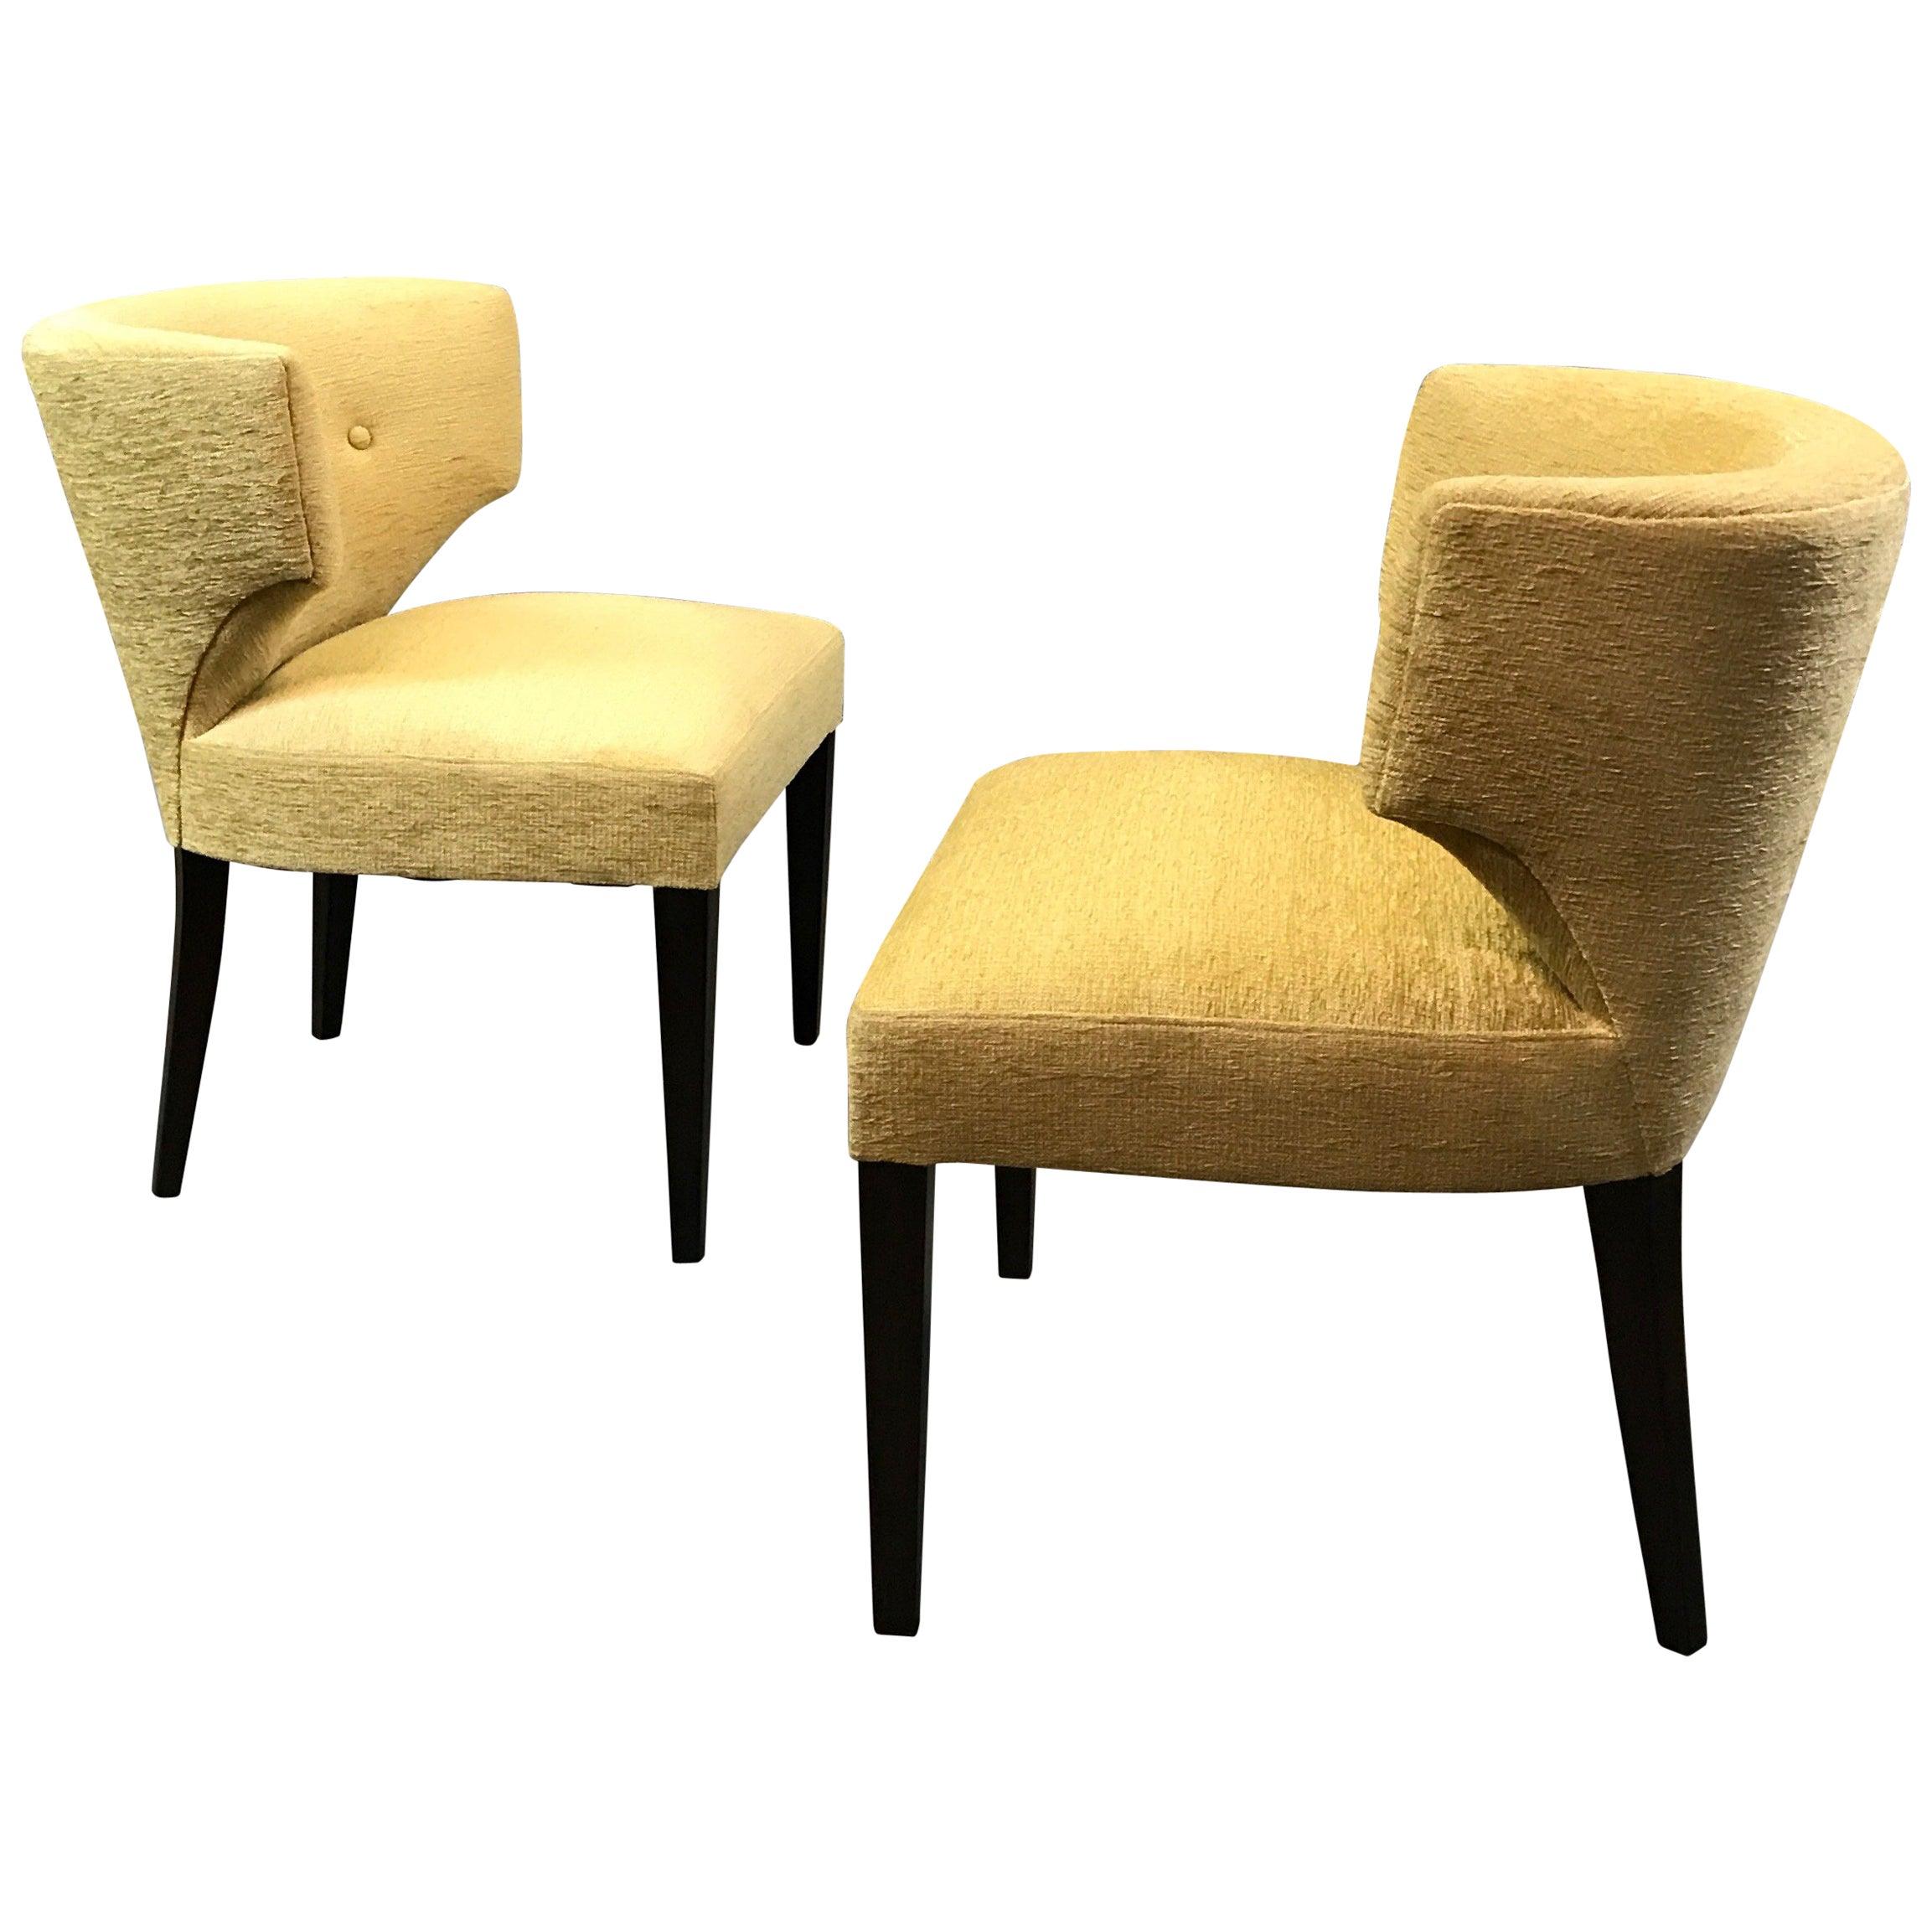 Pair of Hollywood Regency Upholstered Klismos Slipper Chairs